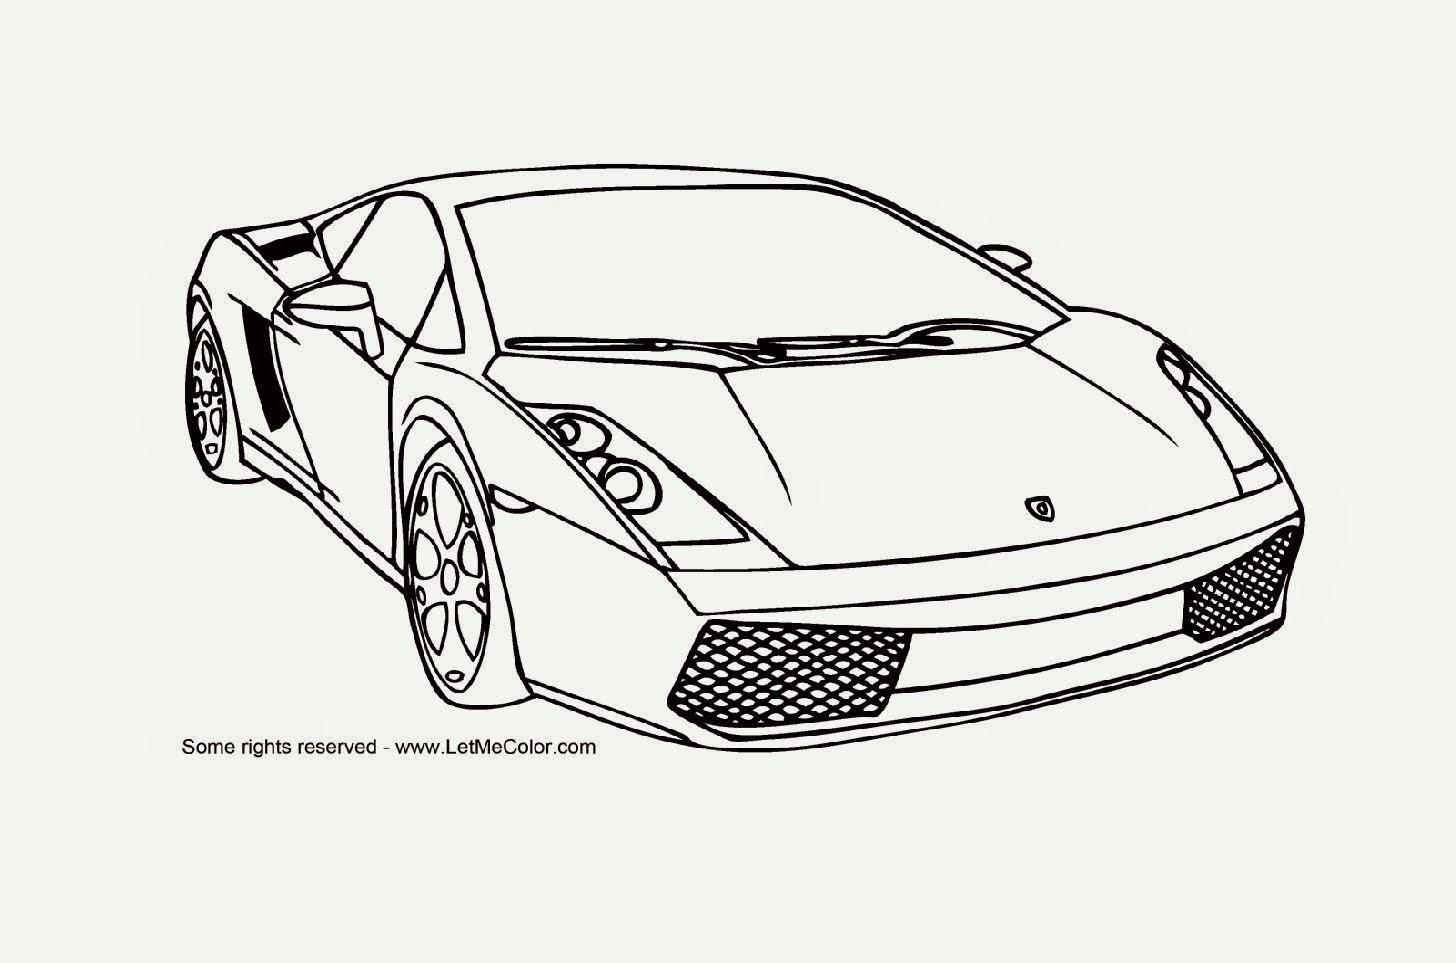 automotivegeneral: lamborghini personam cars wallpapers